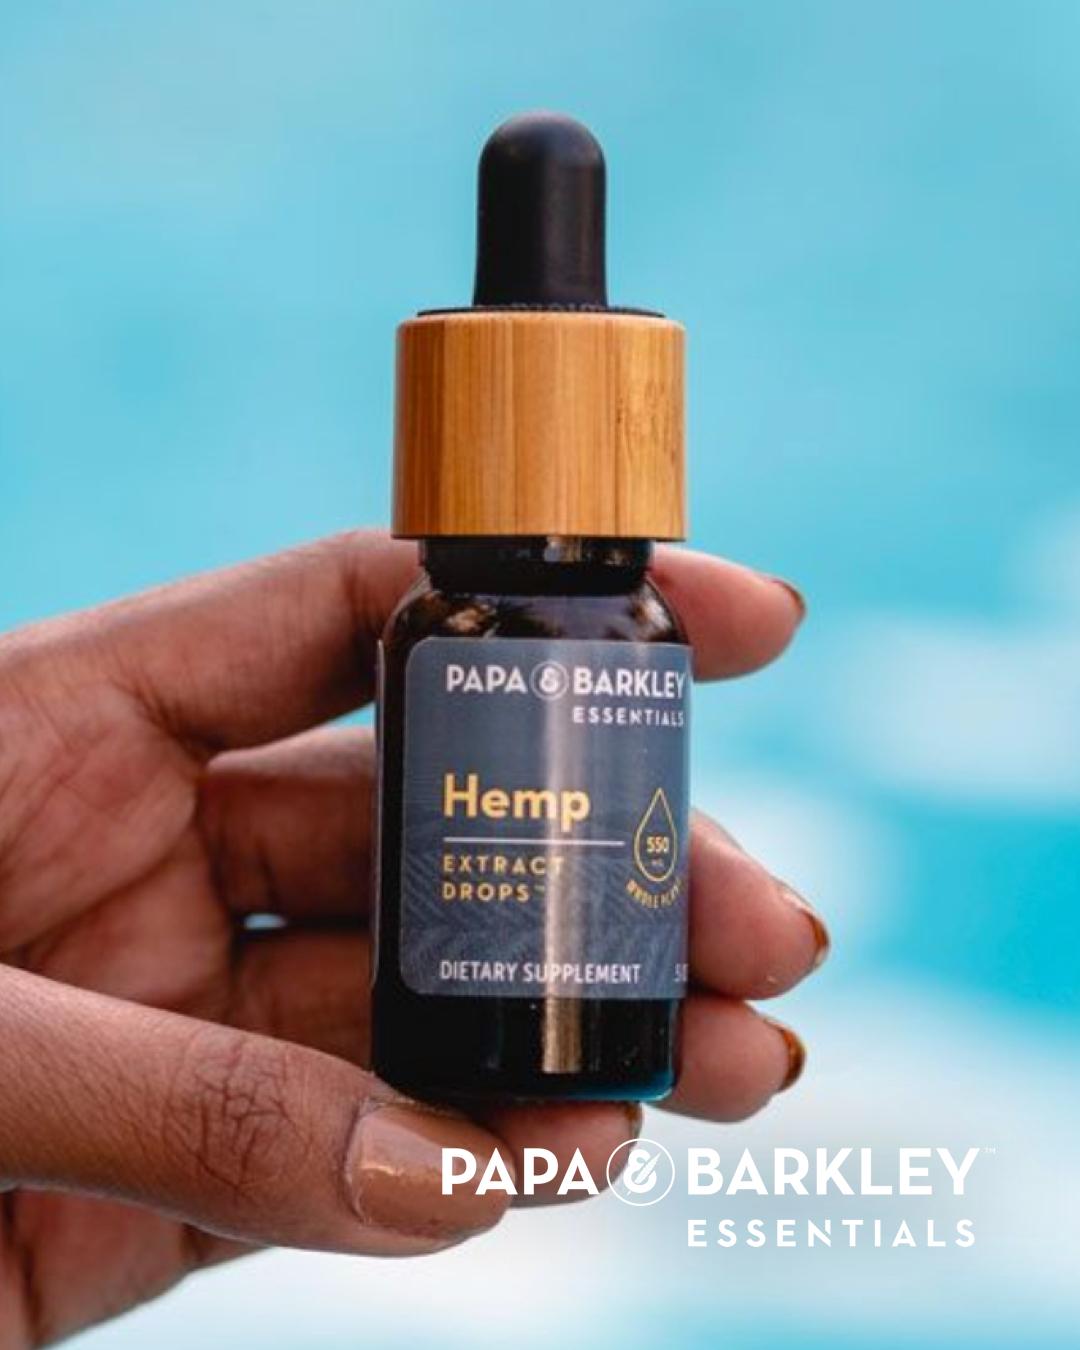 Papa_&_Barkley_West Headshots.001.jpeg